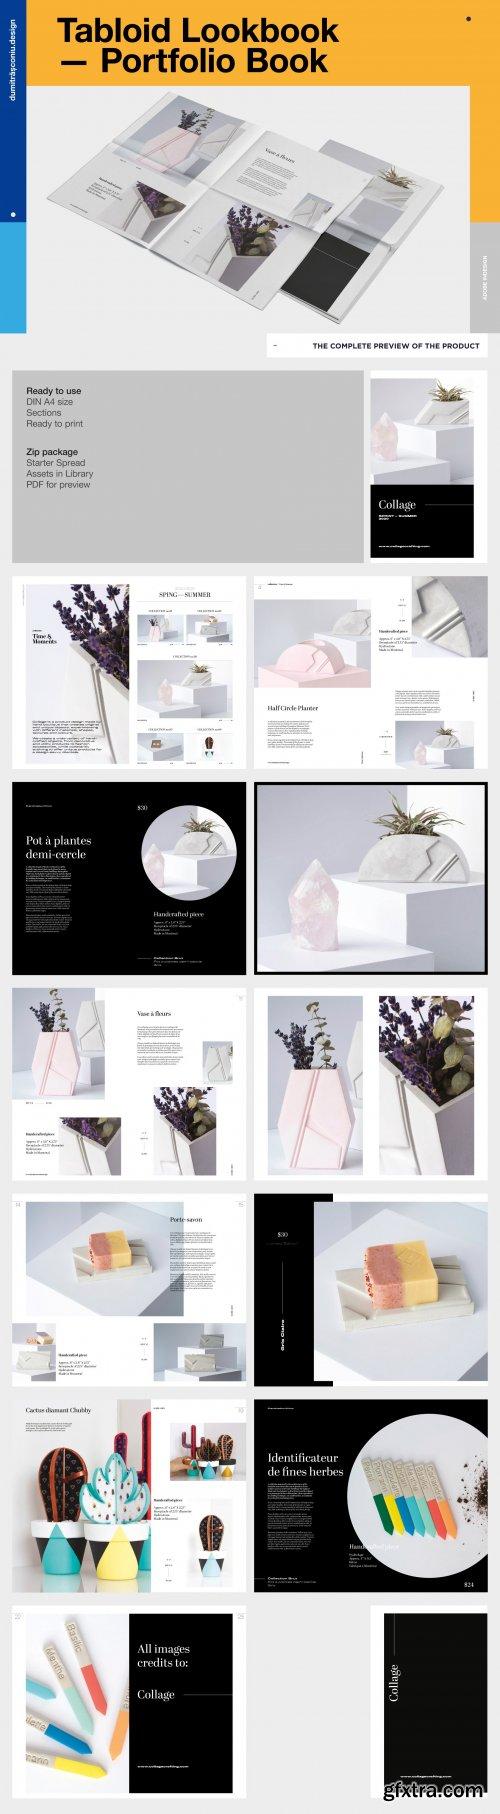 CreativeMarket - Tabloid Lookbook / Portfolio 4127826